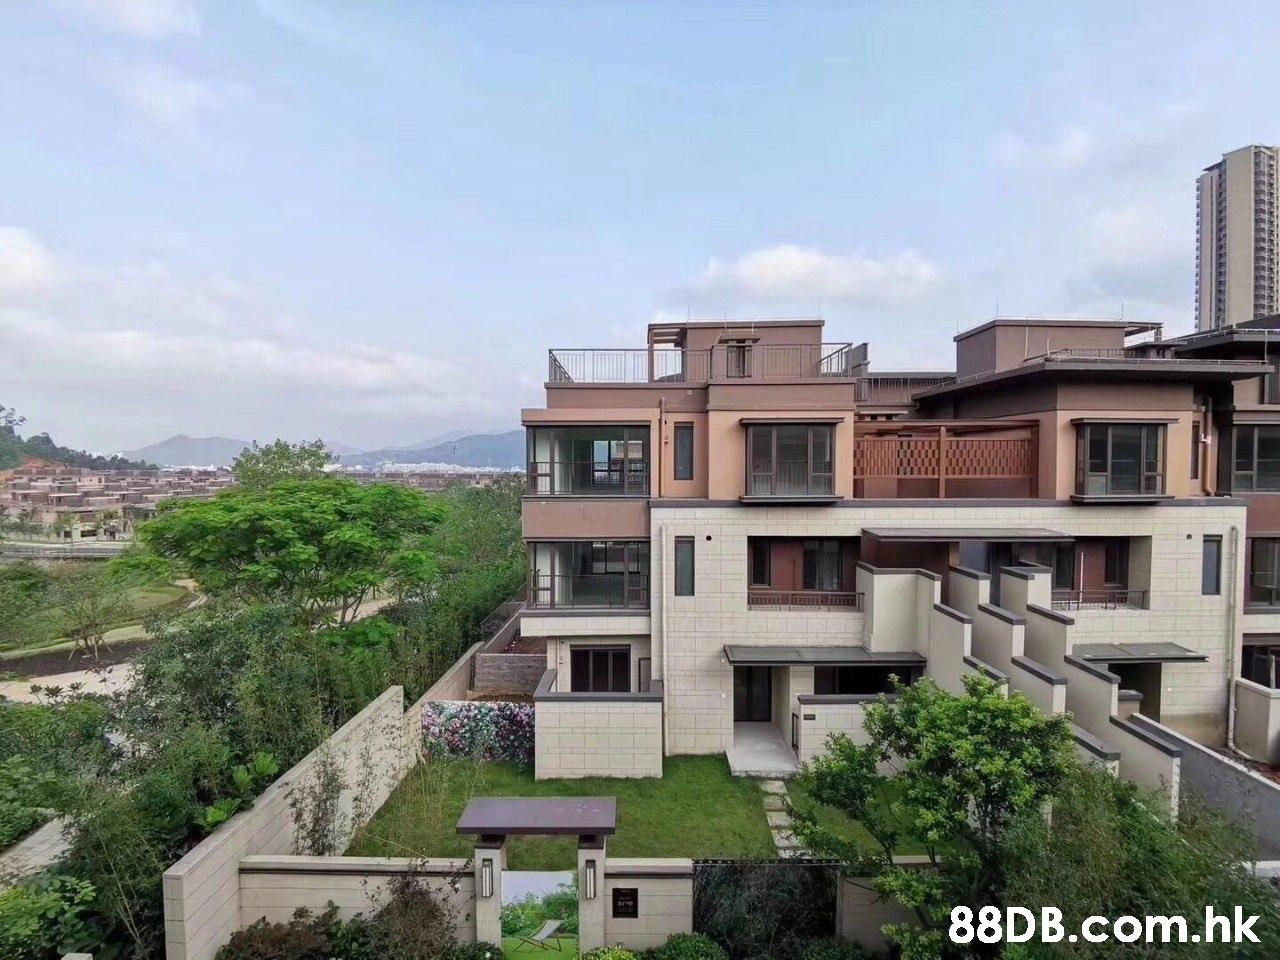 .hk  Residential area,Property,Building,Neighbourhood,Apartment